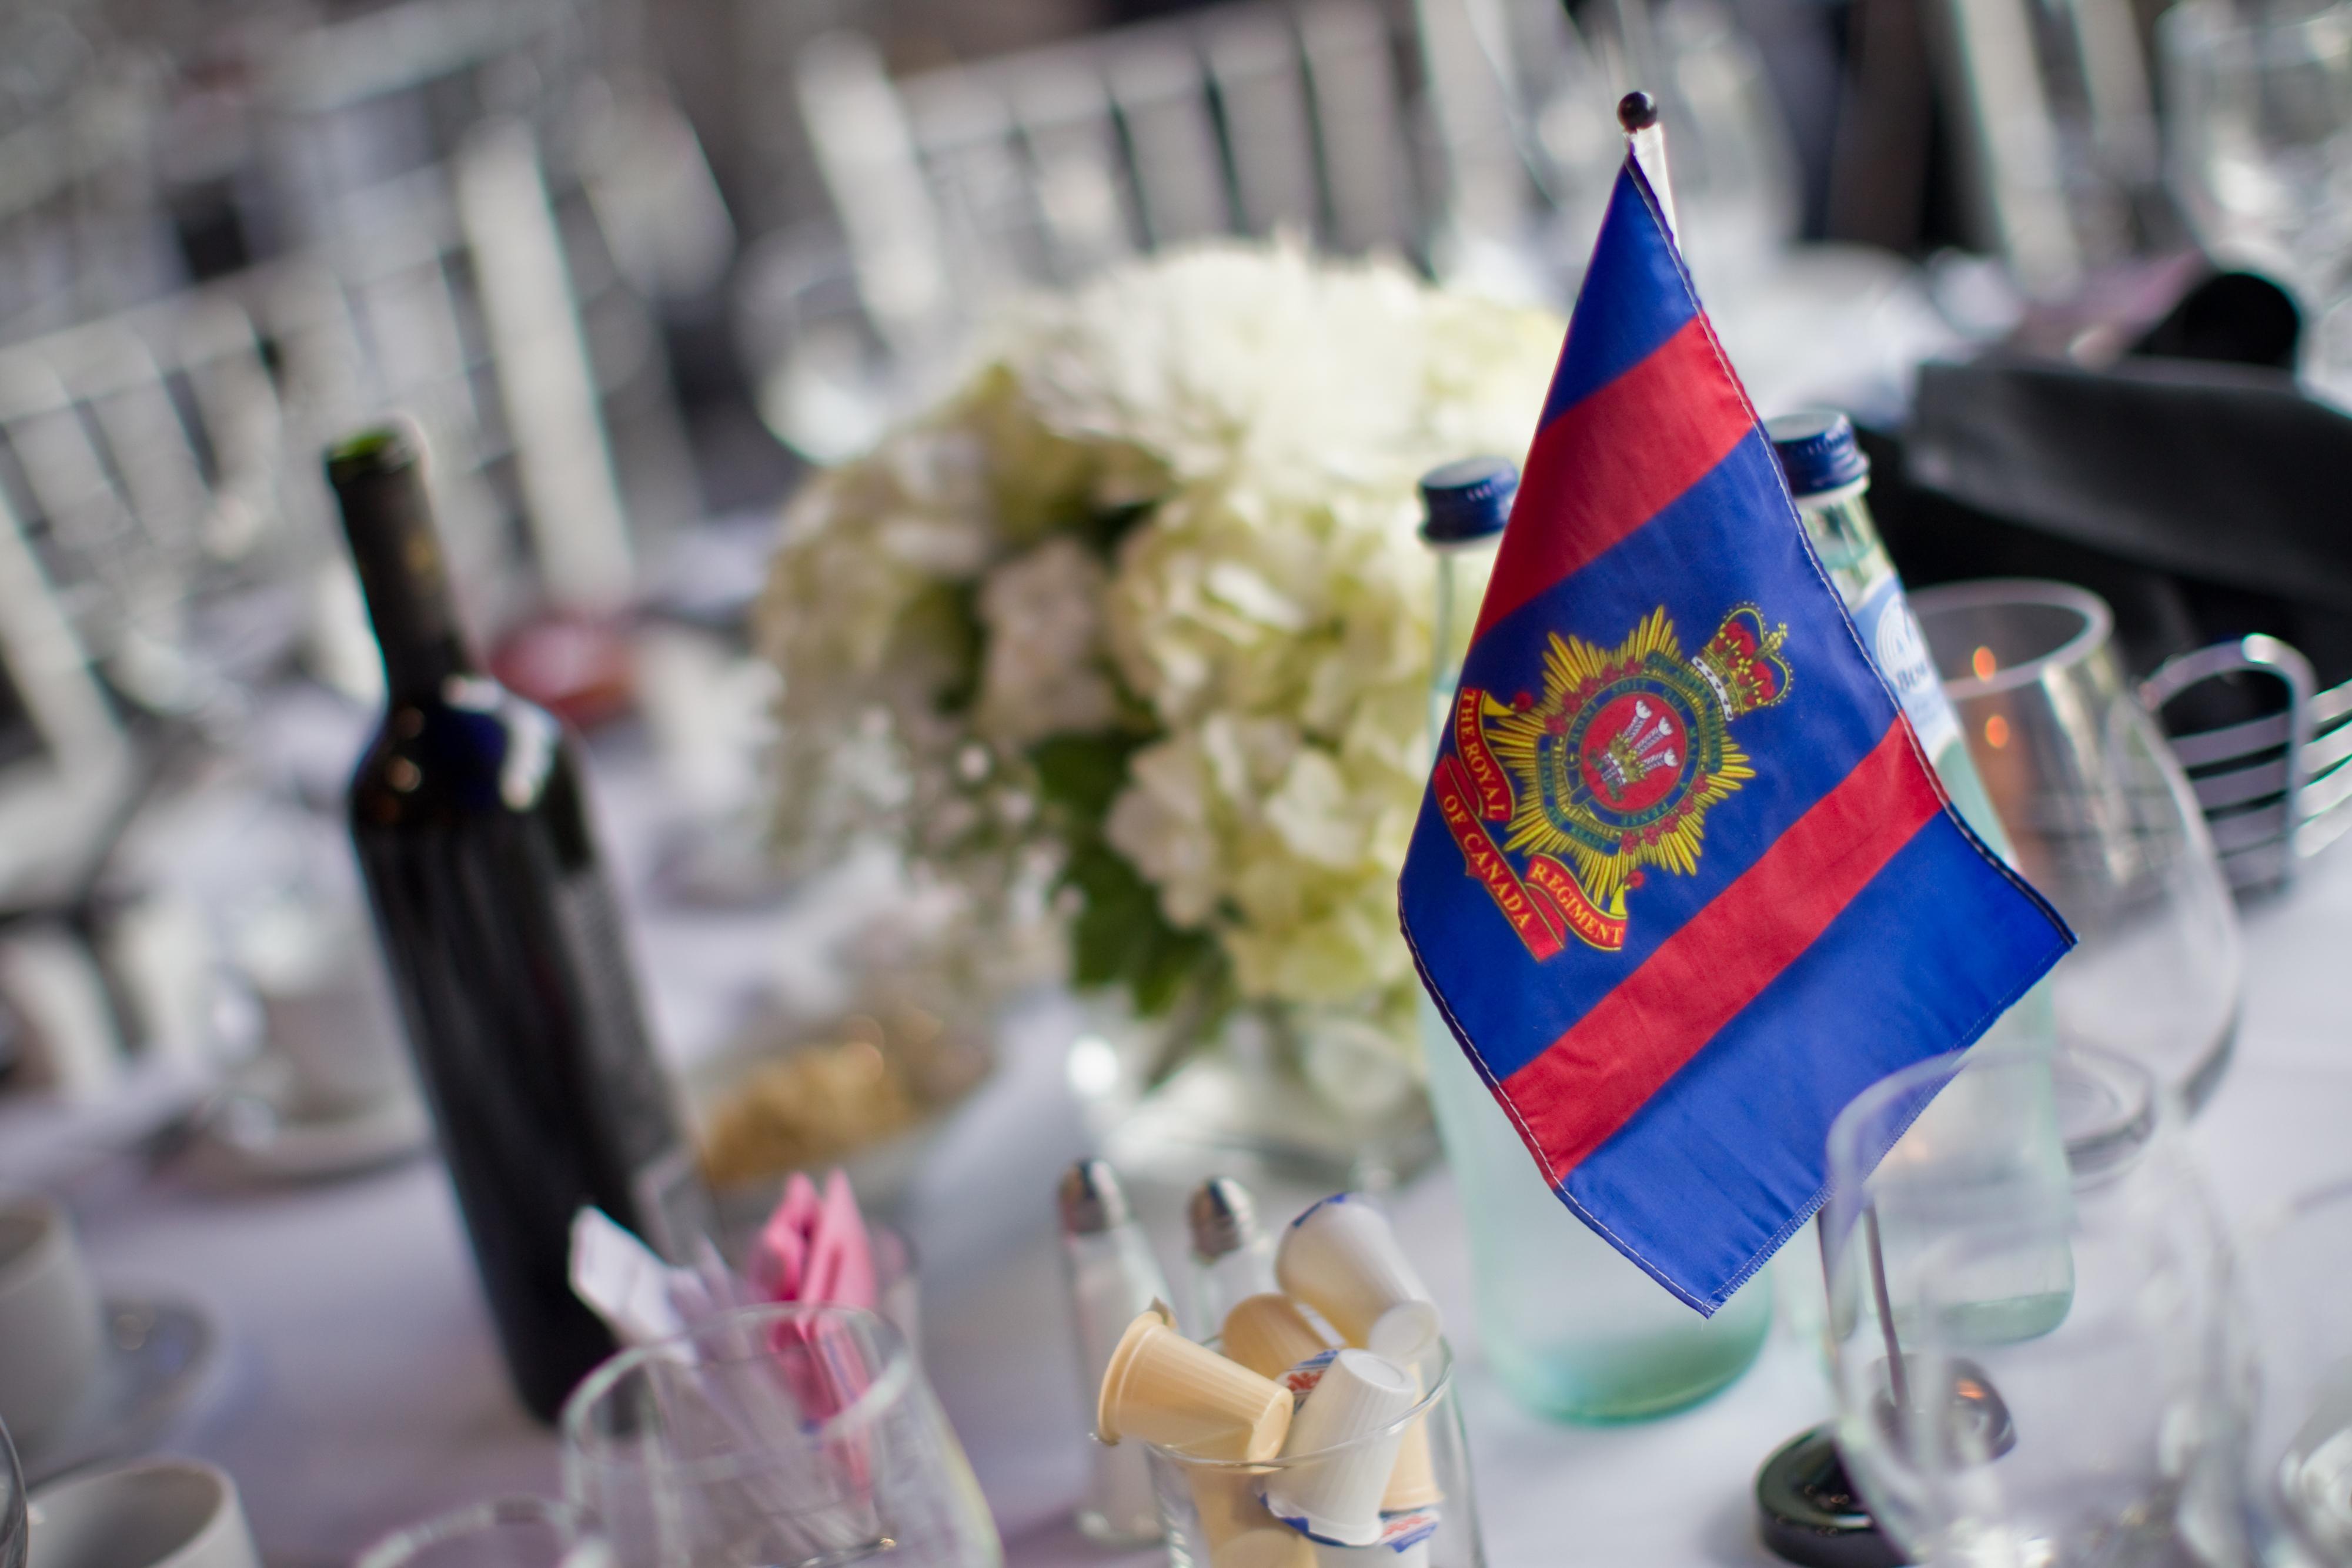 2nd Annual Regimental Ball - The Royal Regime